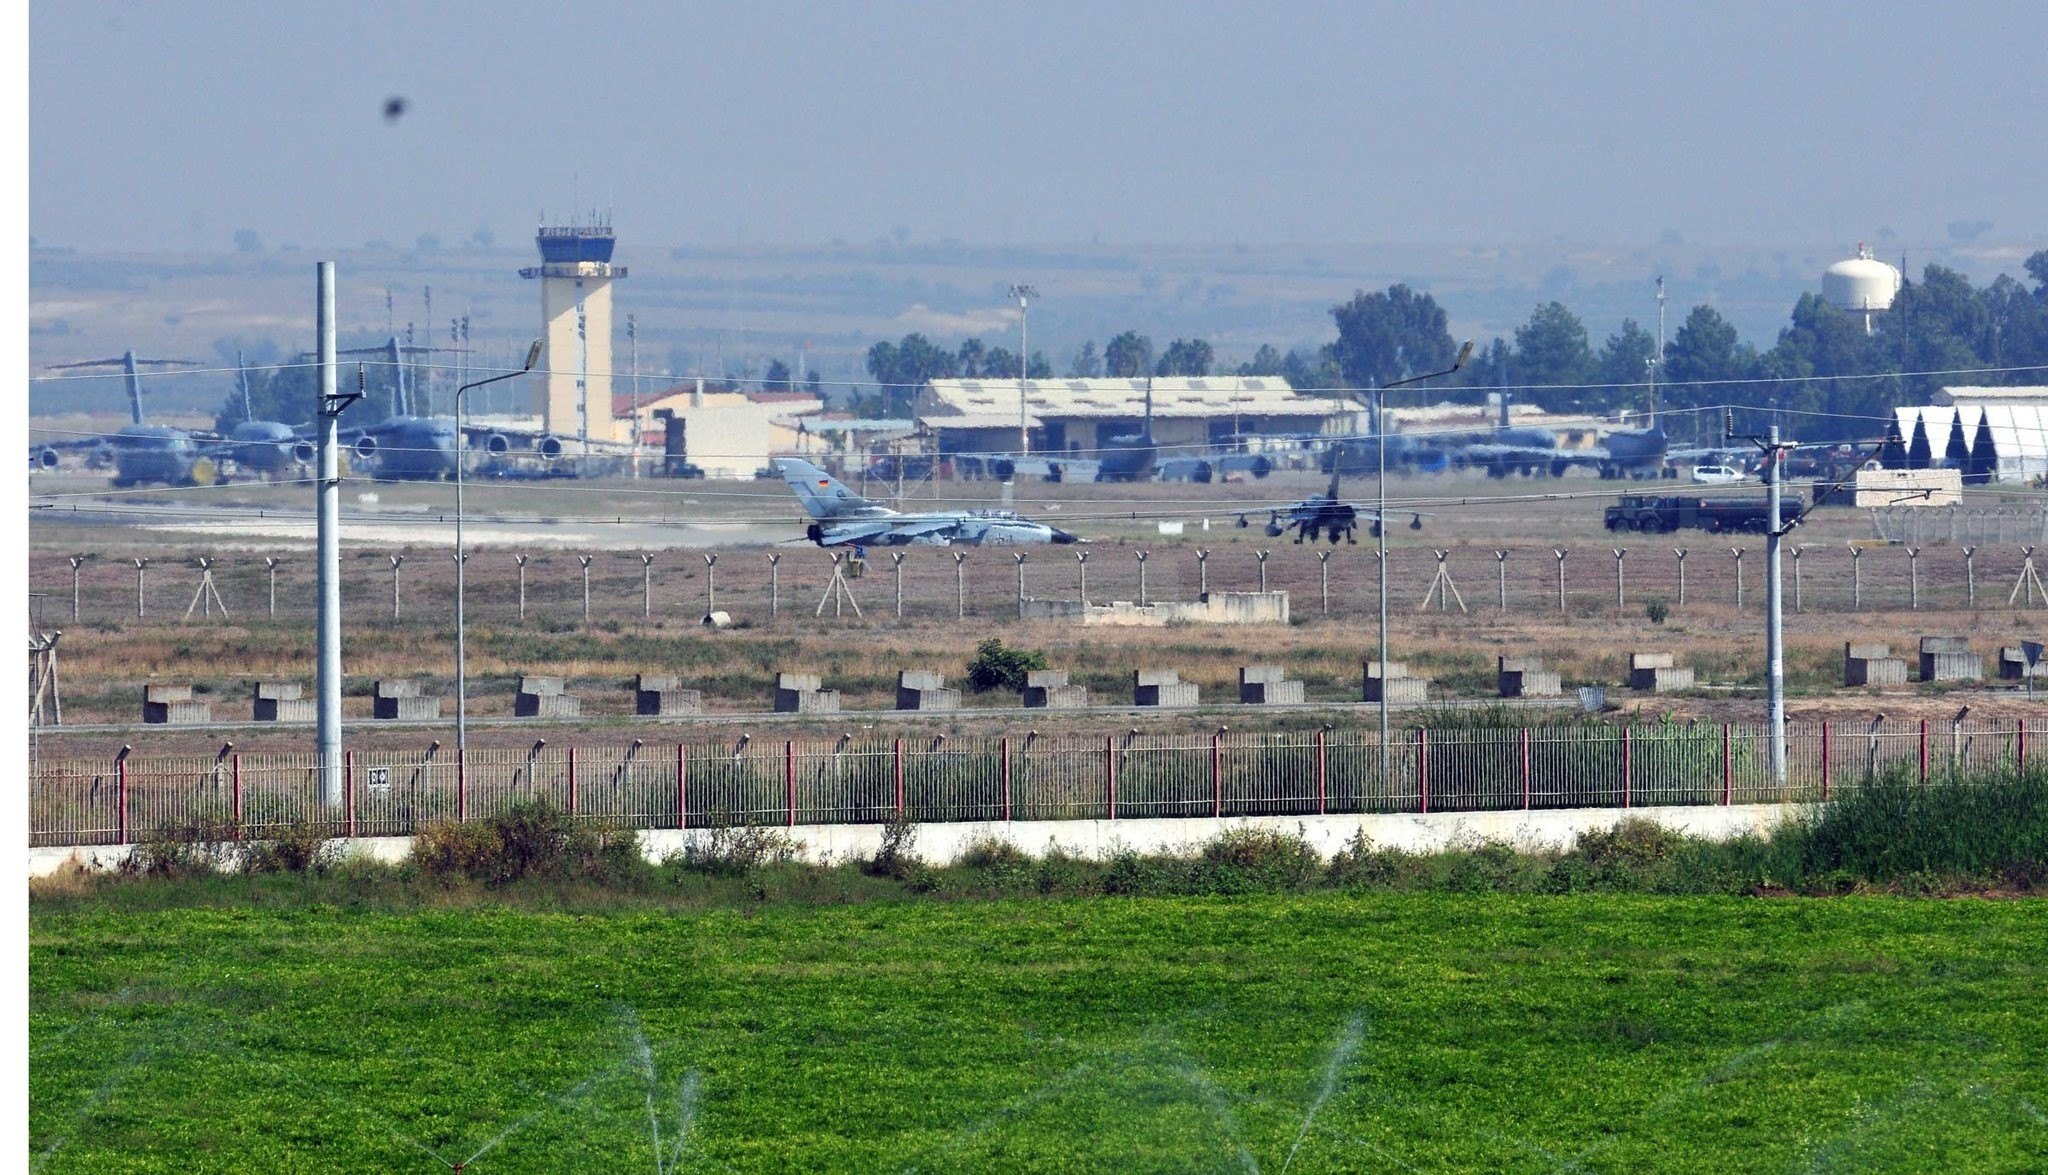 Incirlik Air Base in Adana, Turkey.